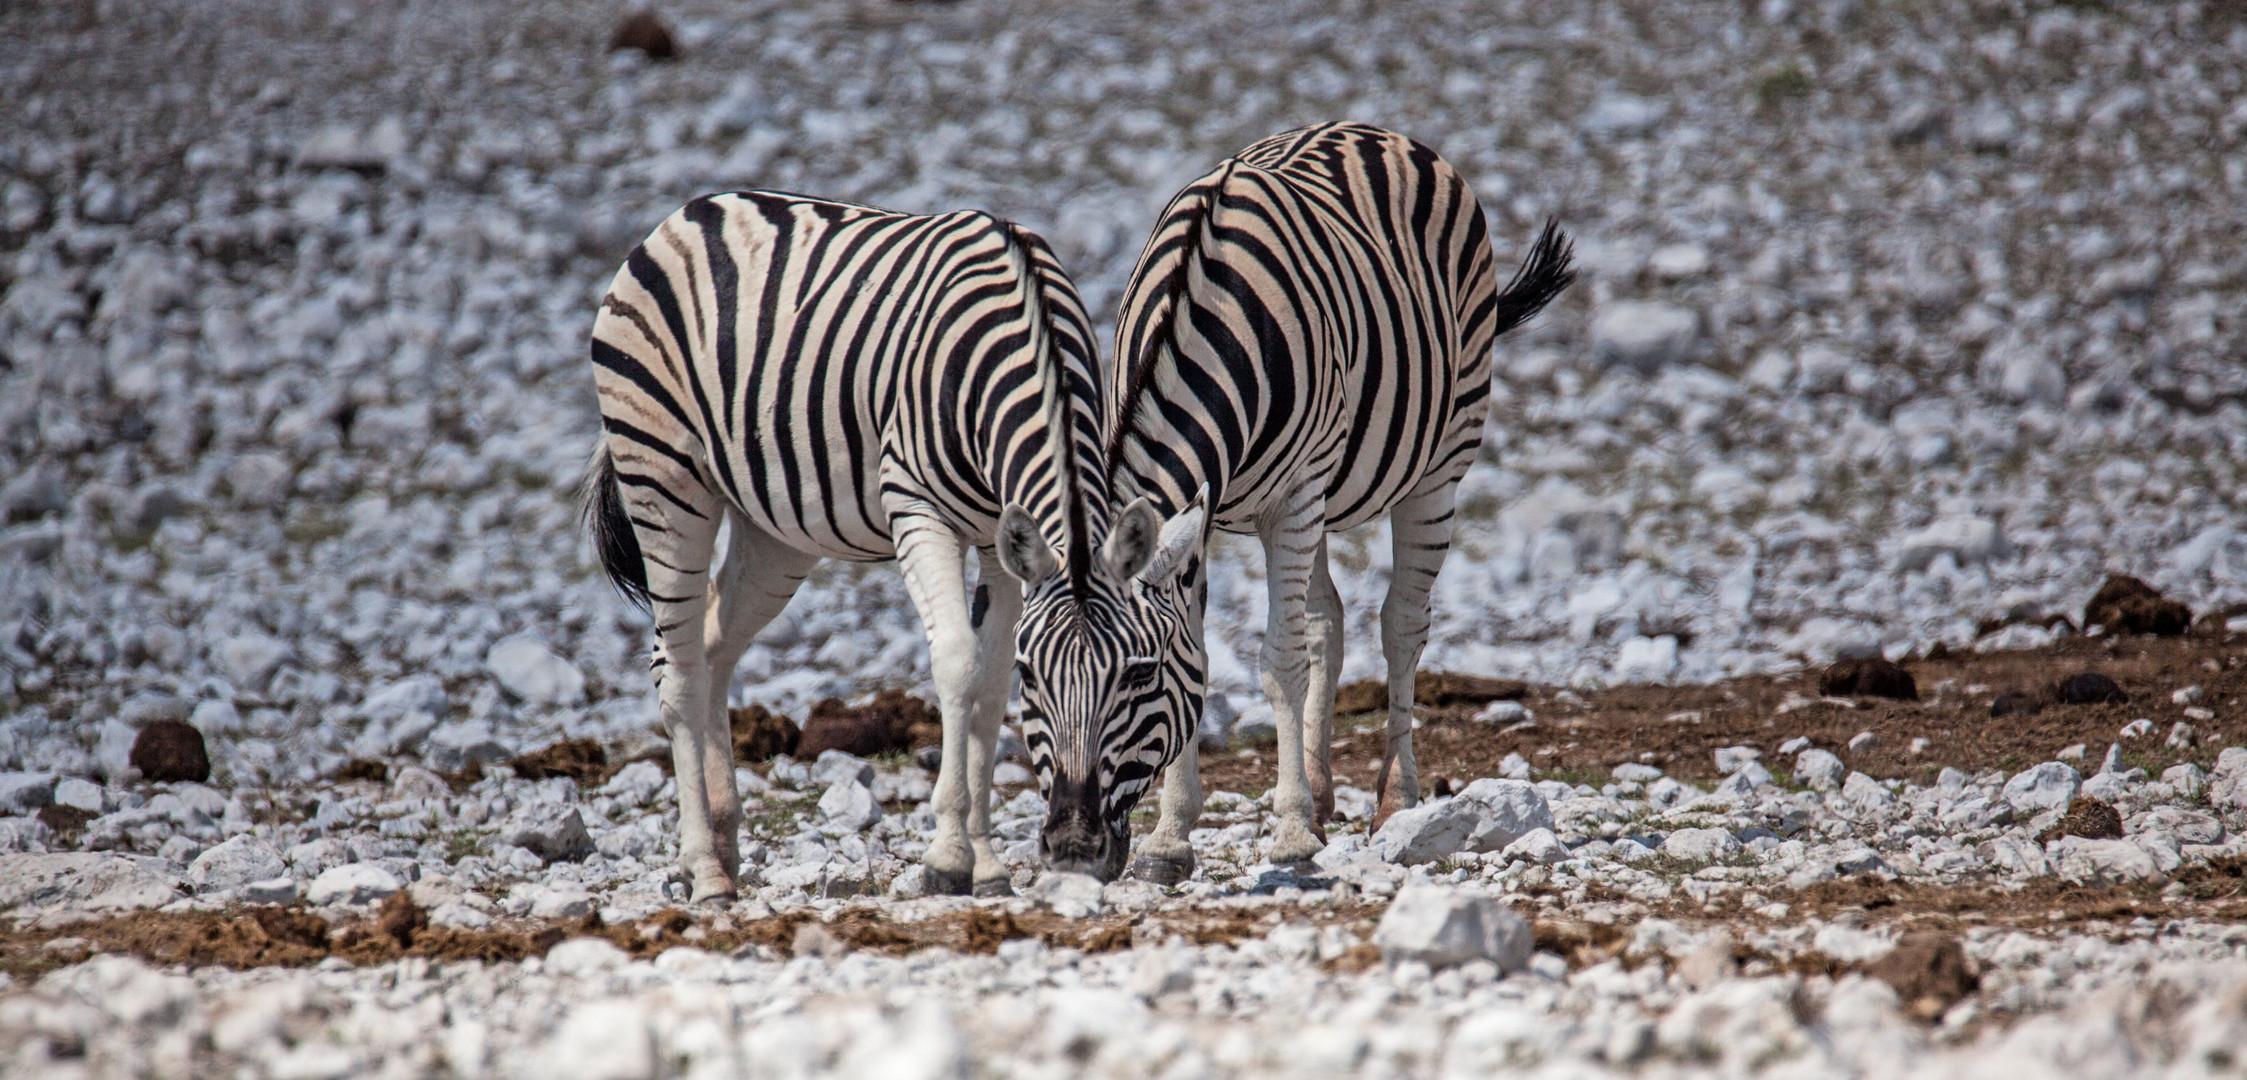 Zebras- Siamesische Zwillinge